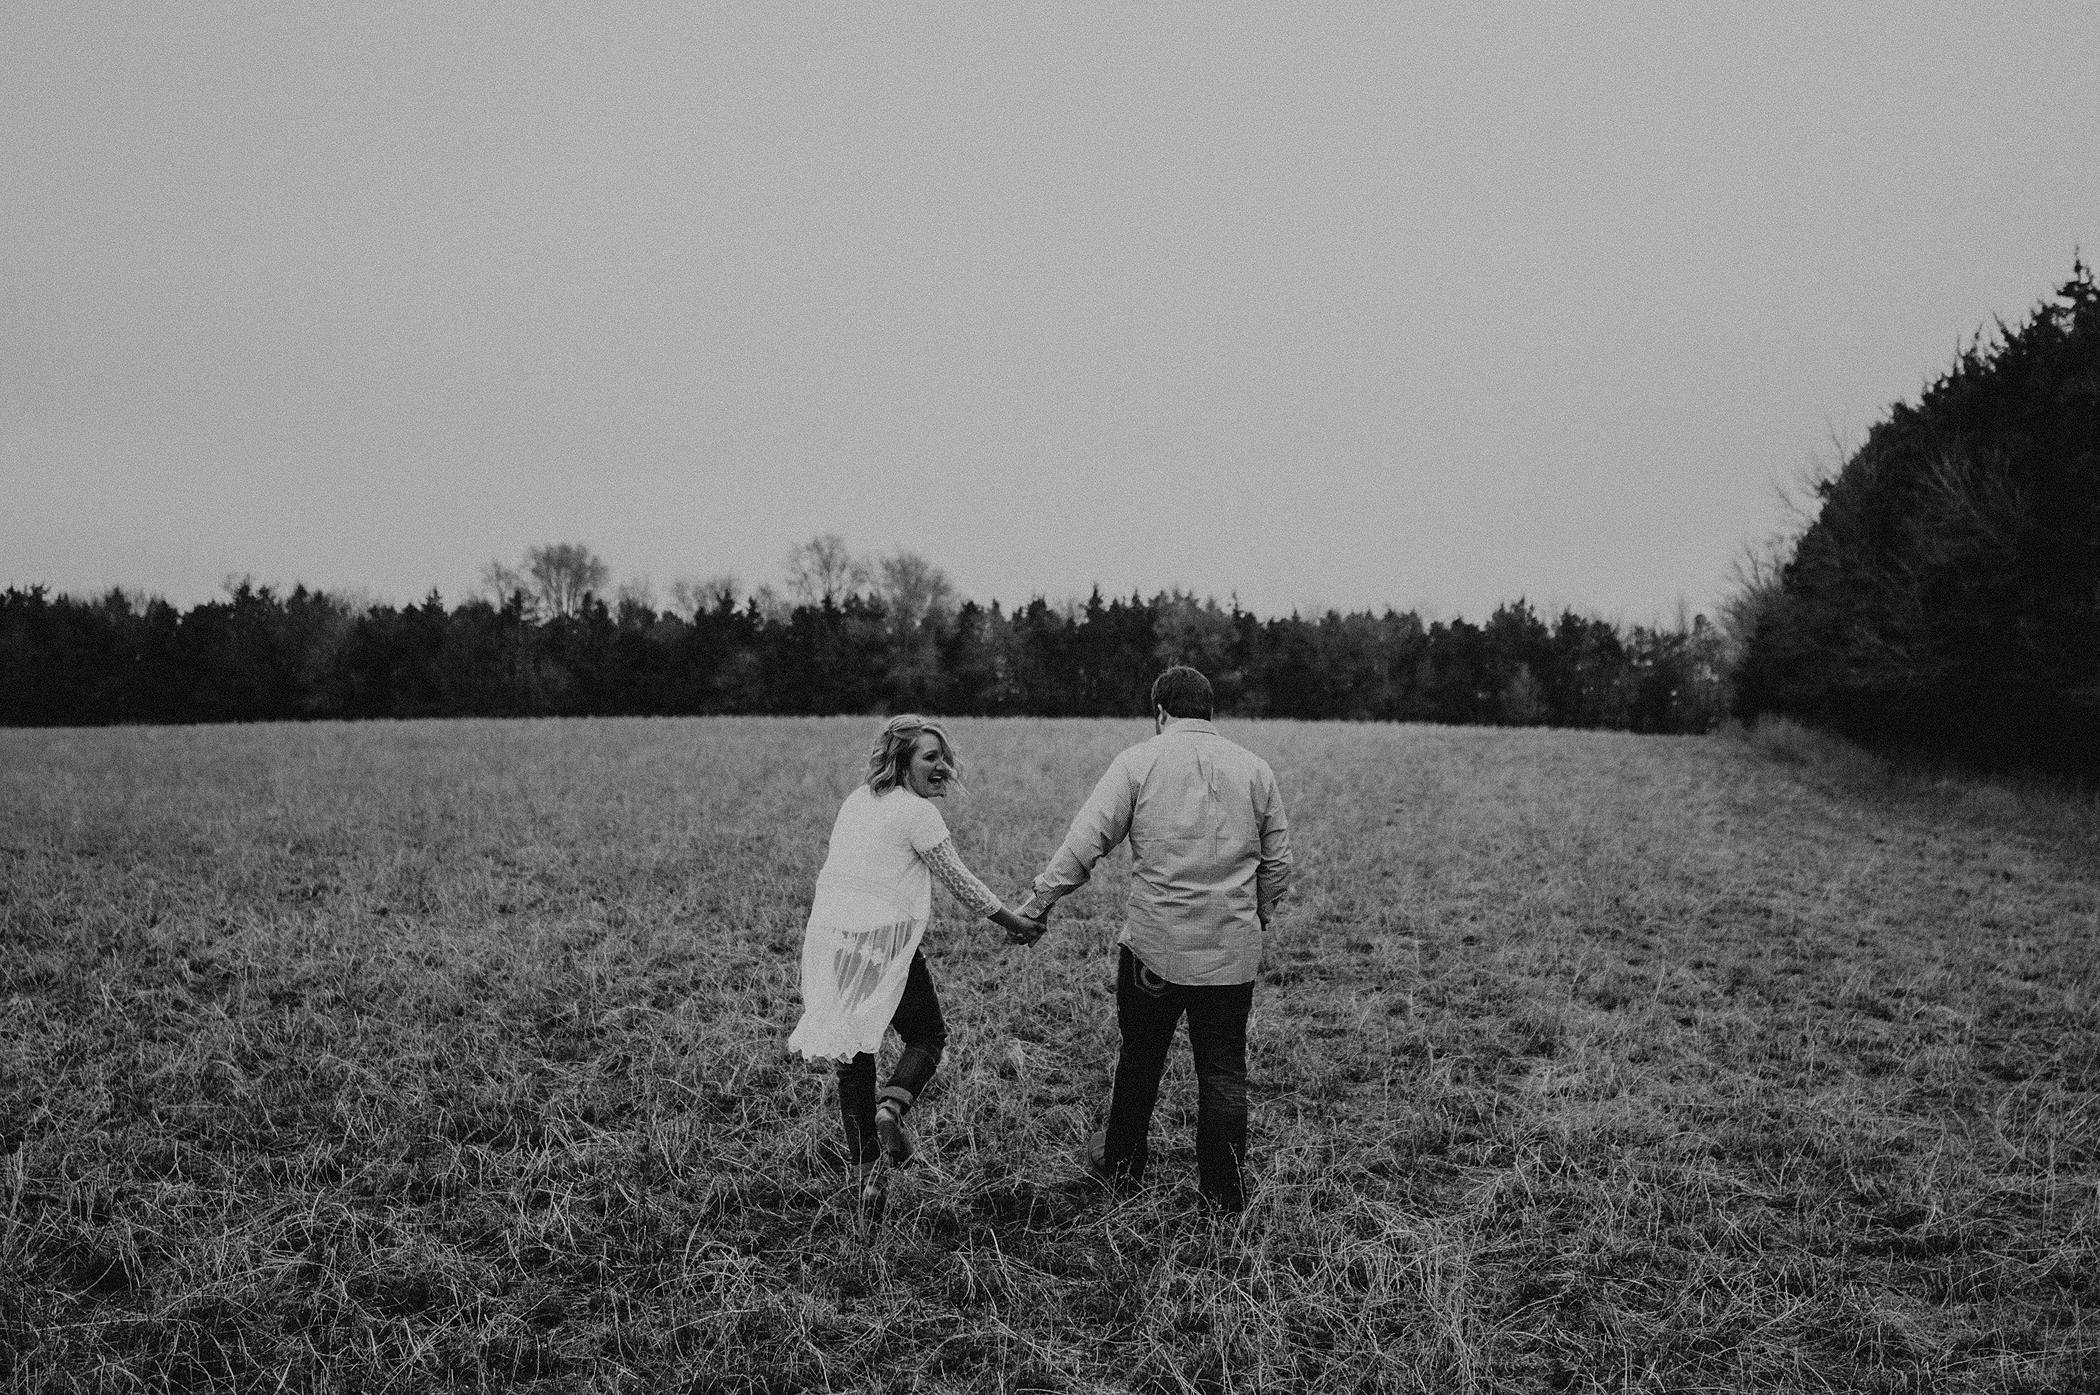 kaylie-sirek-nebraska-wedding-engagement-photographer-photography-grand-island-kearney-hastings-lincoln-01.png